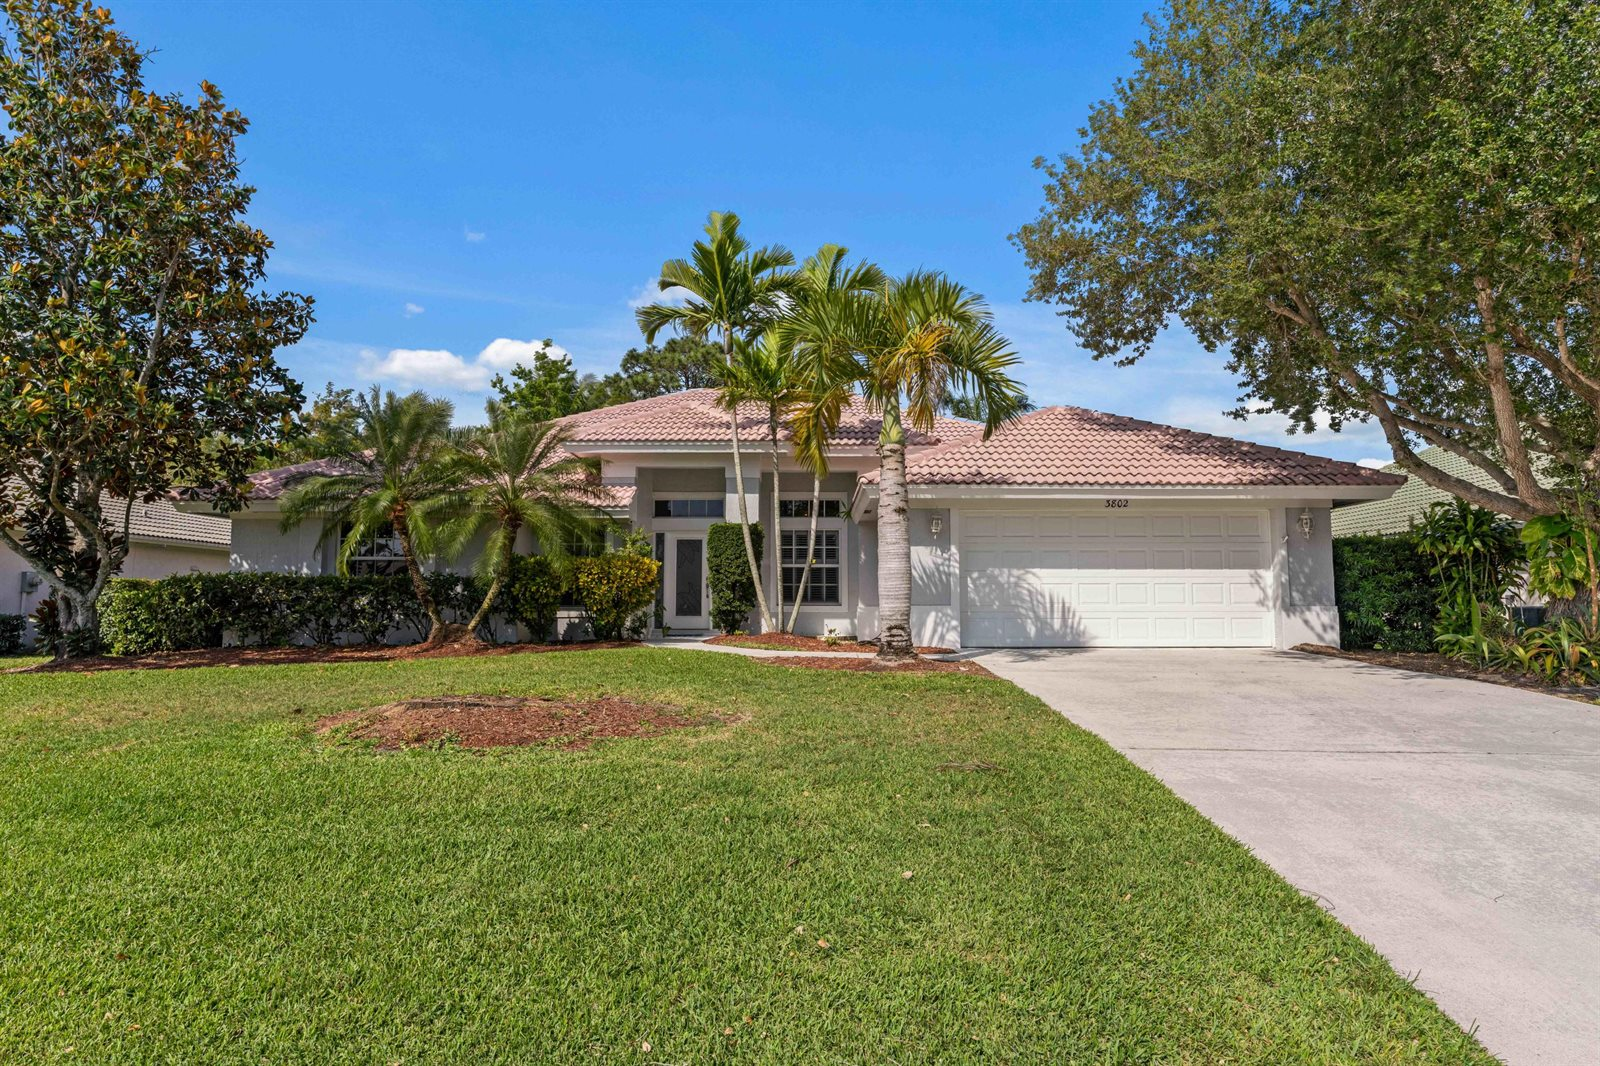 3802 SE Fairway West, Stuart, FL 34997